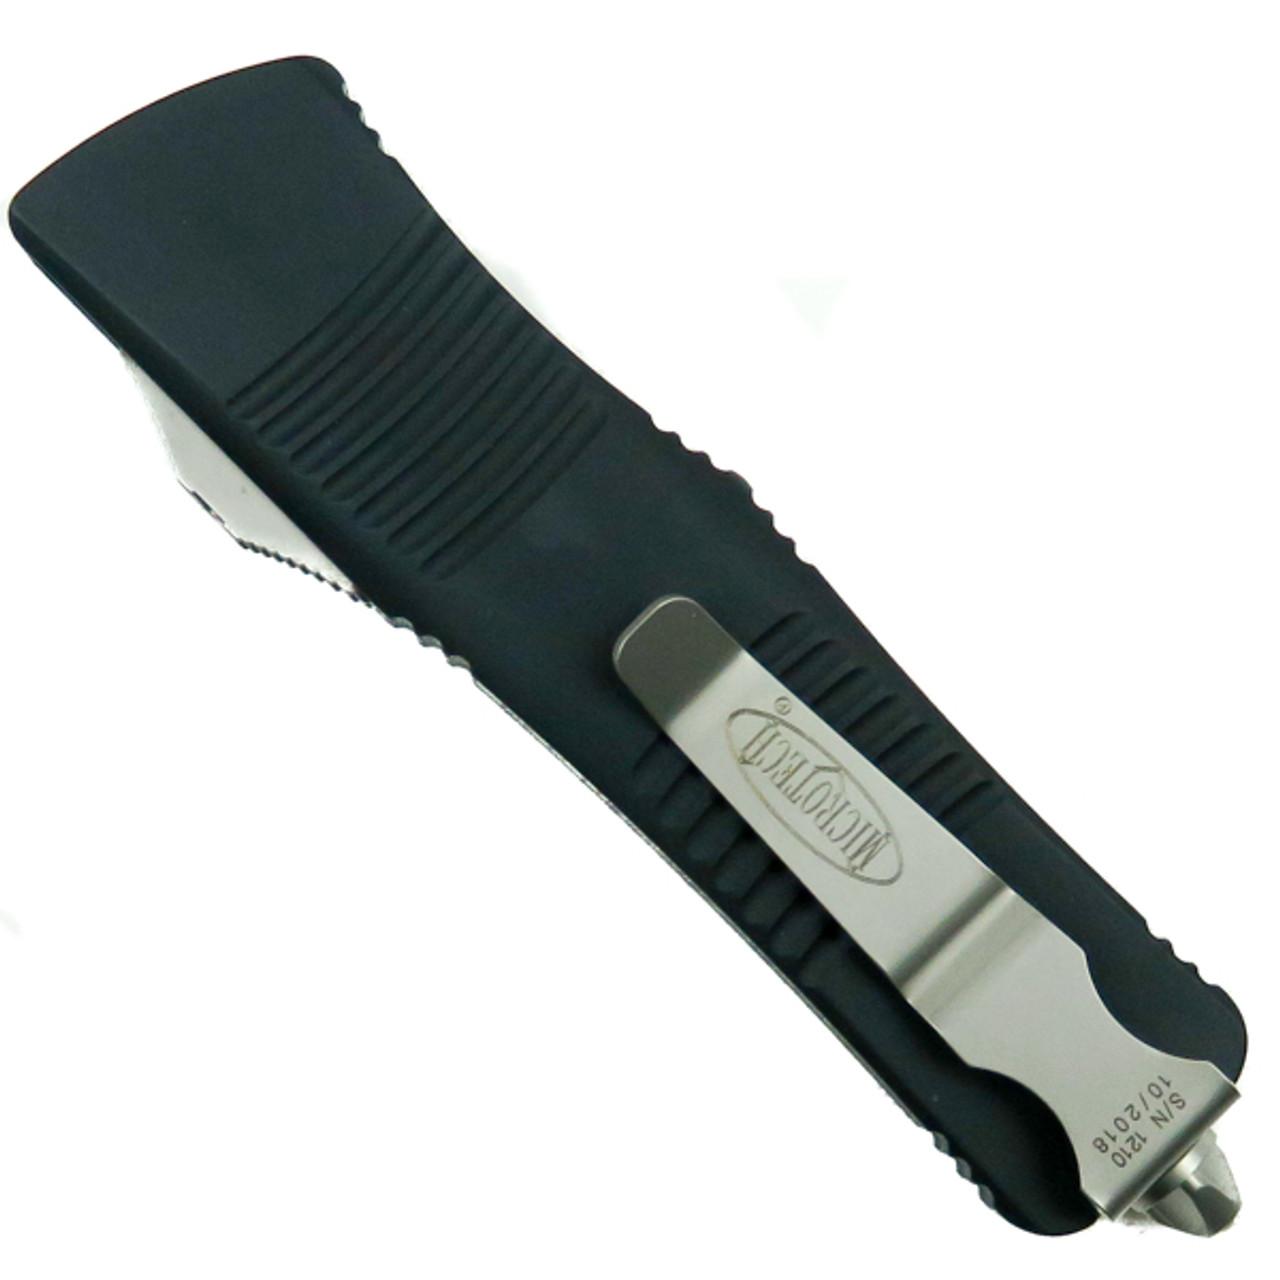 Microtech 139-5 Troodon S/E OTF Auto Knife, Satin Combo Blade